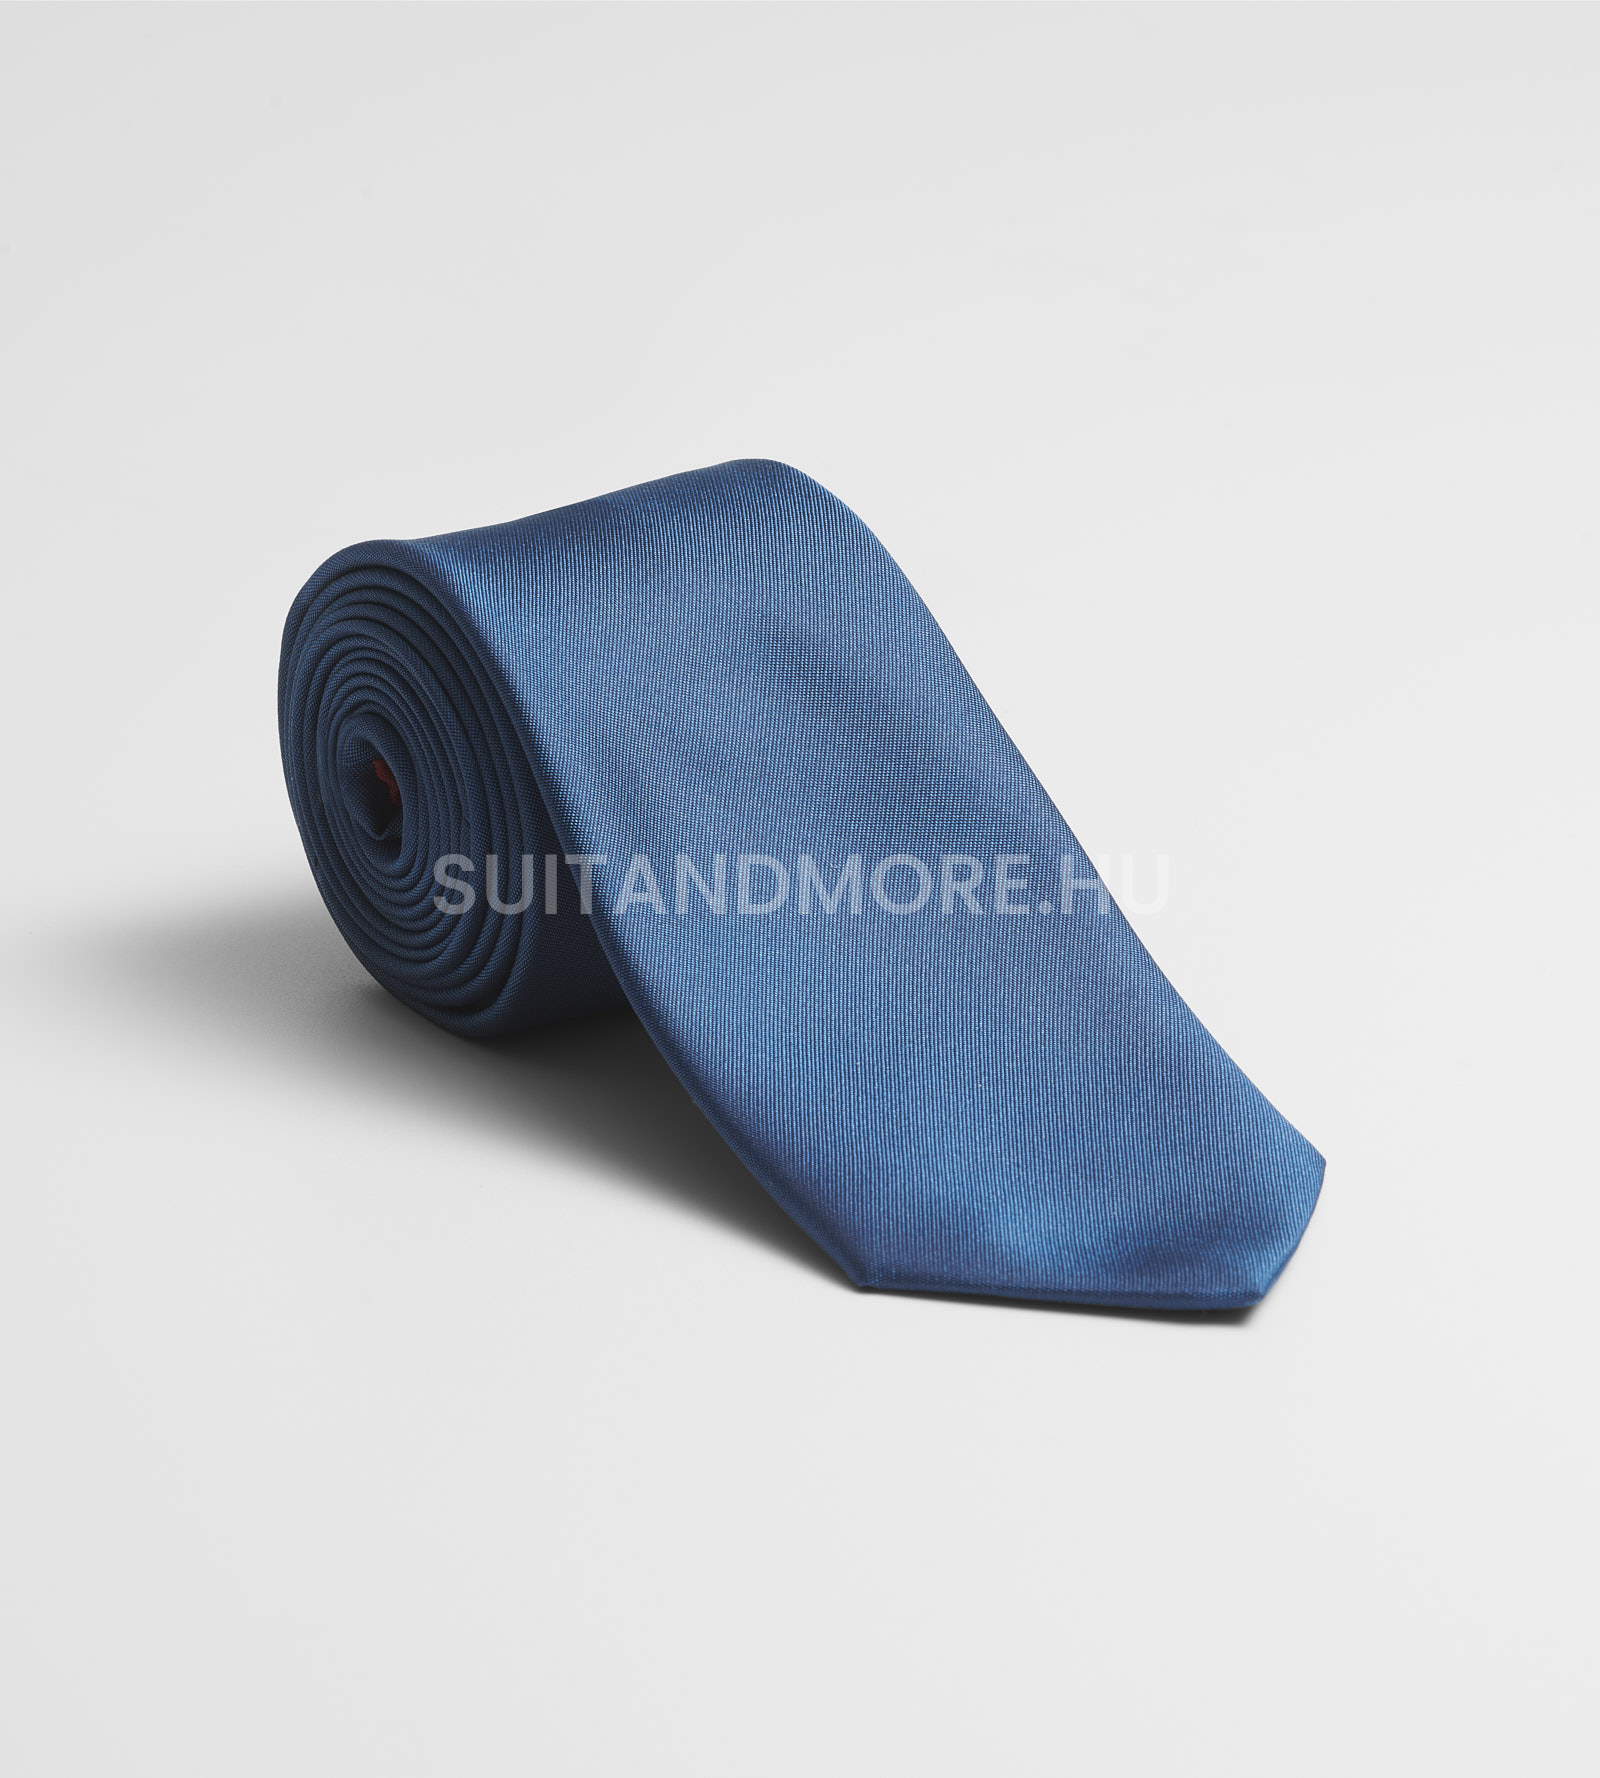 olymp-sotetkek-strukturalt-selyem-nyakkendo-2690-00-08-01